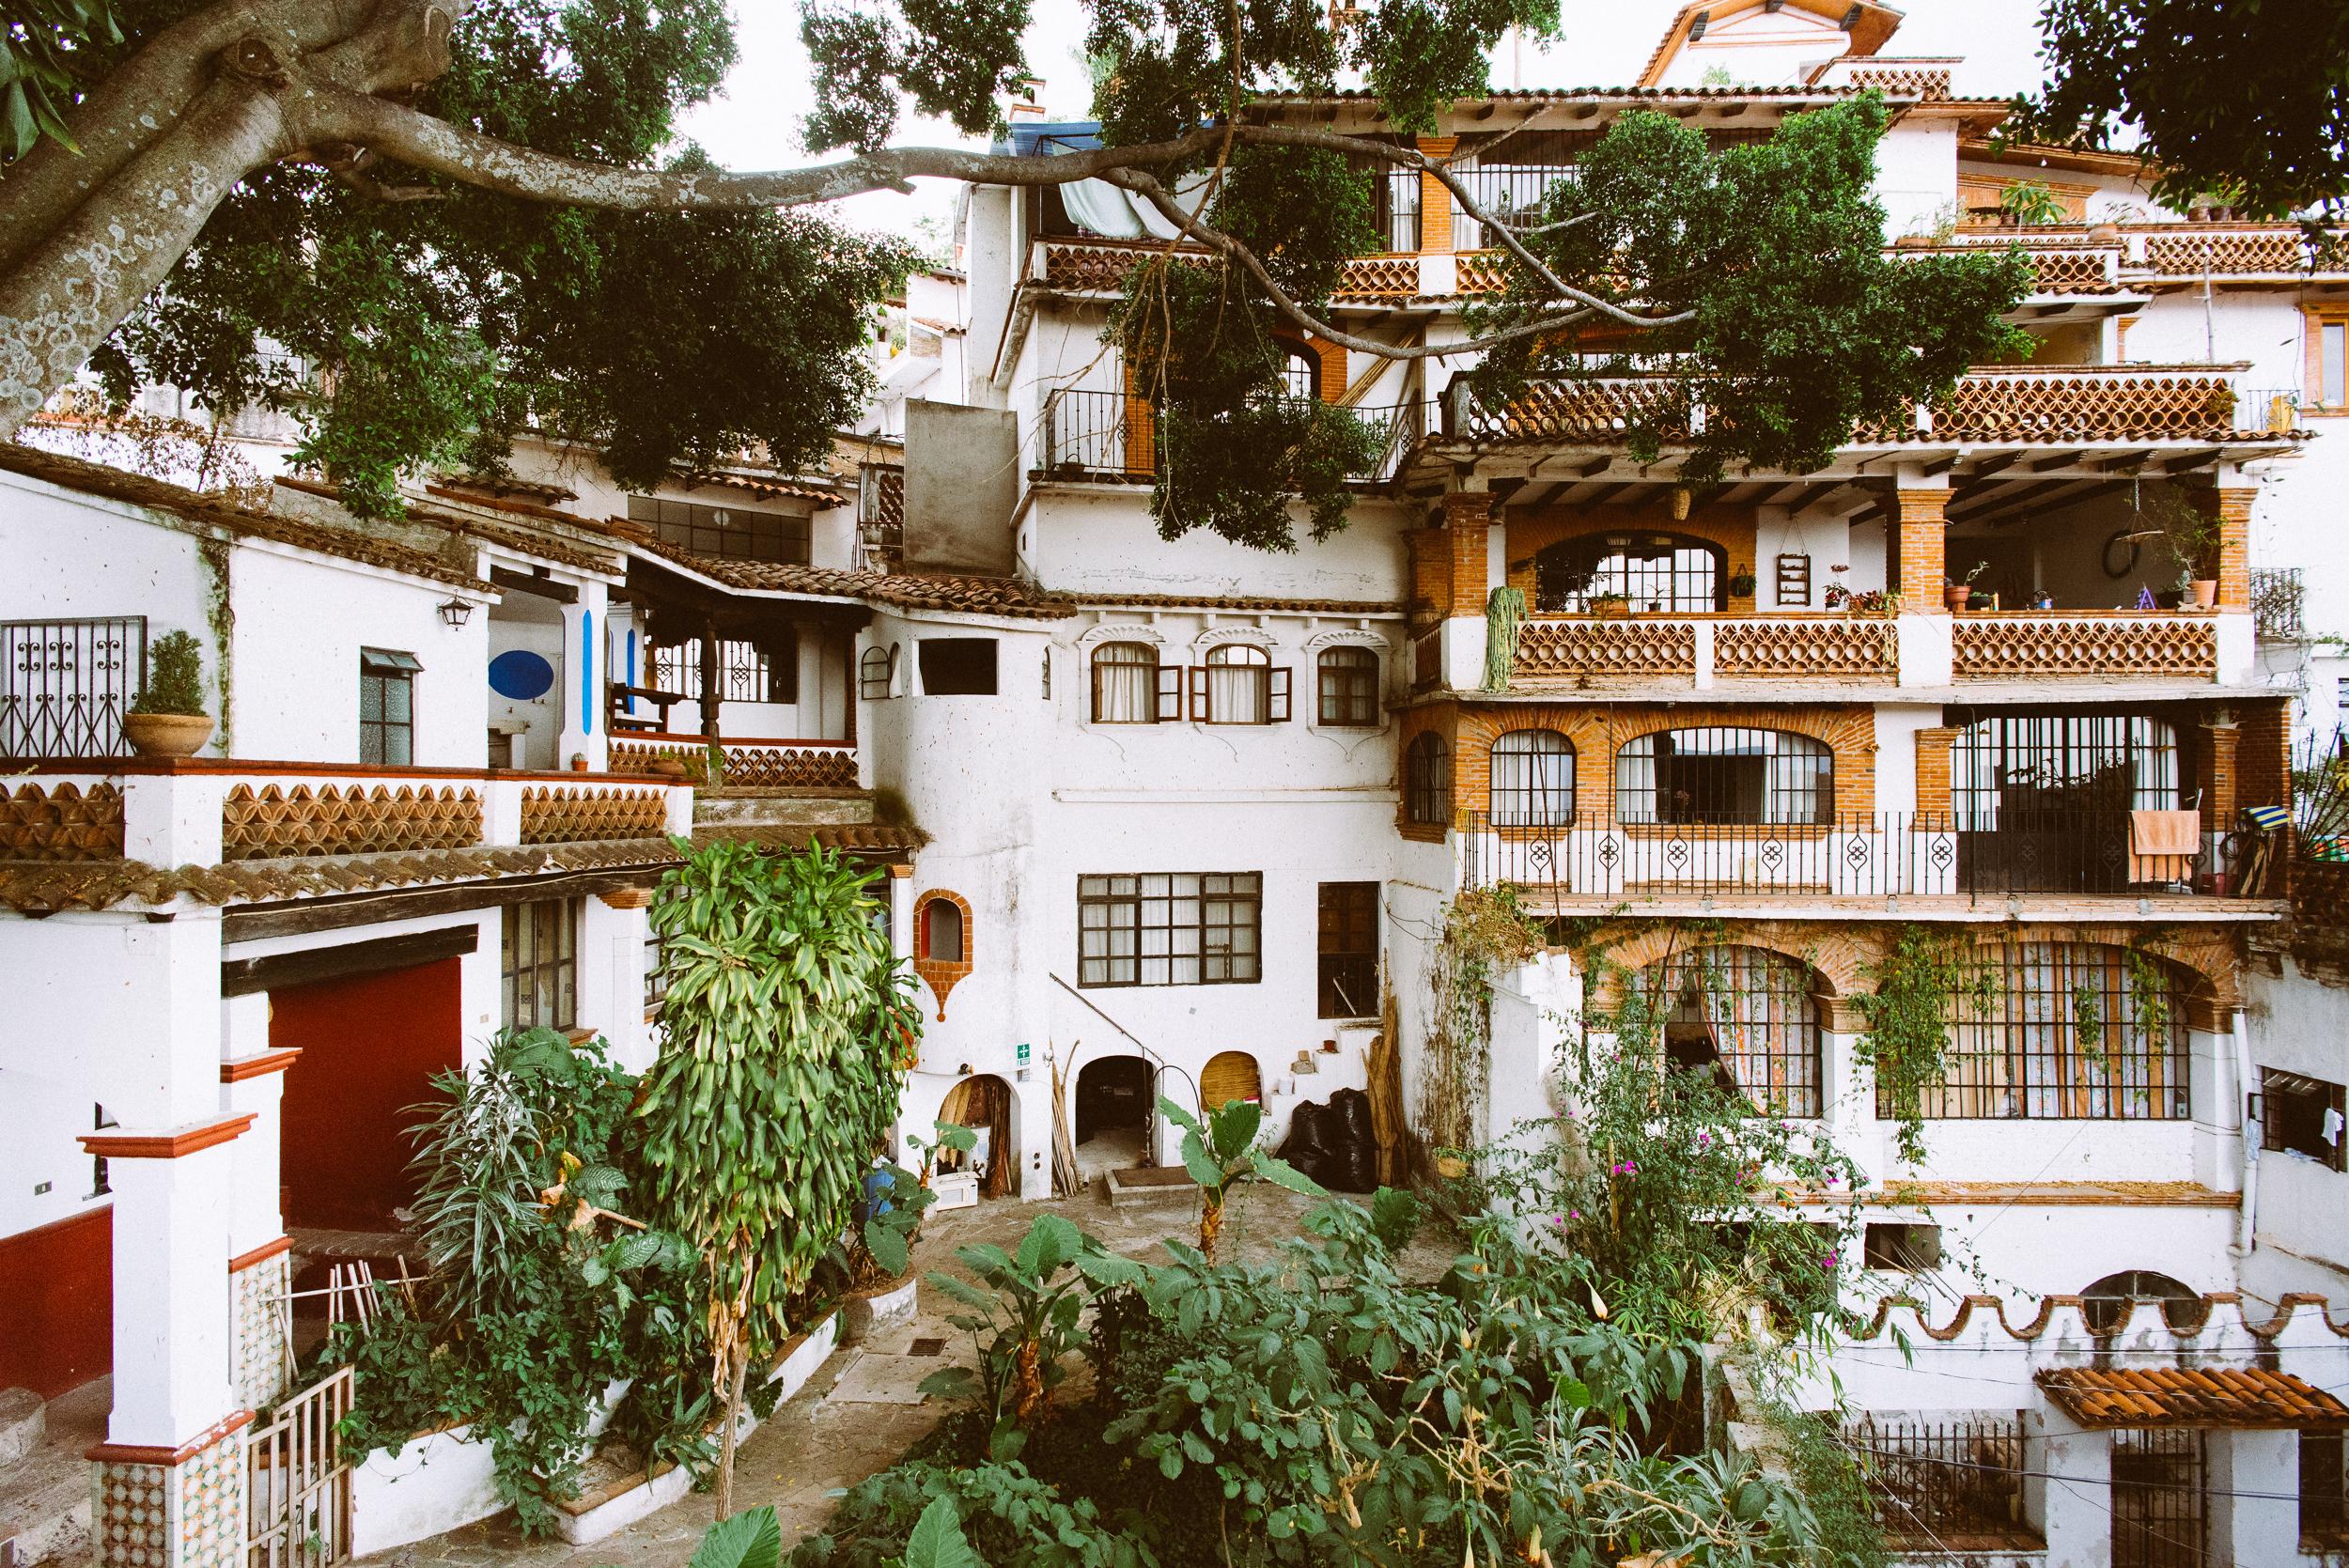 Violante's house